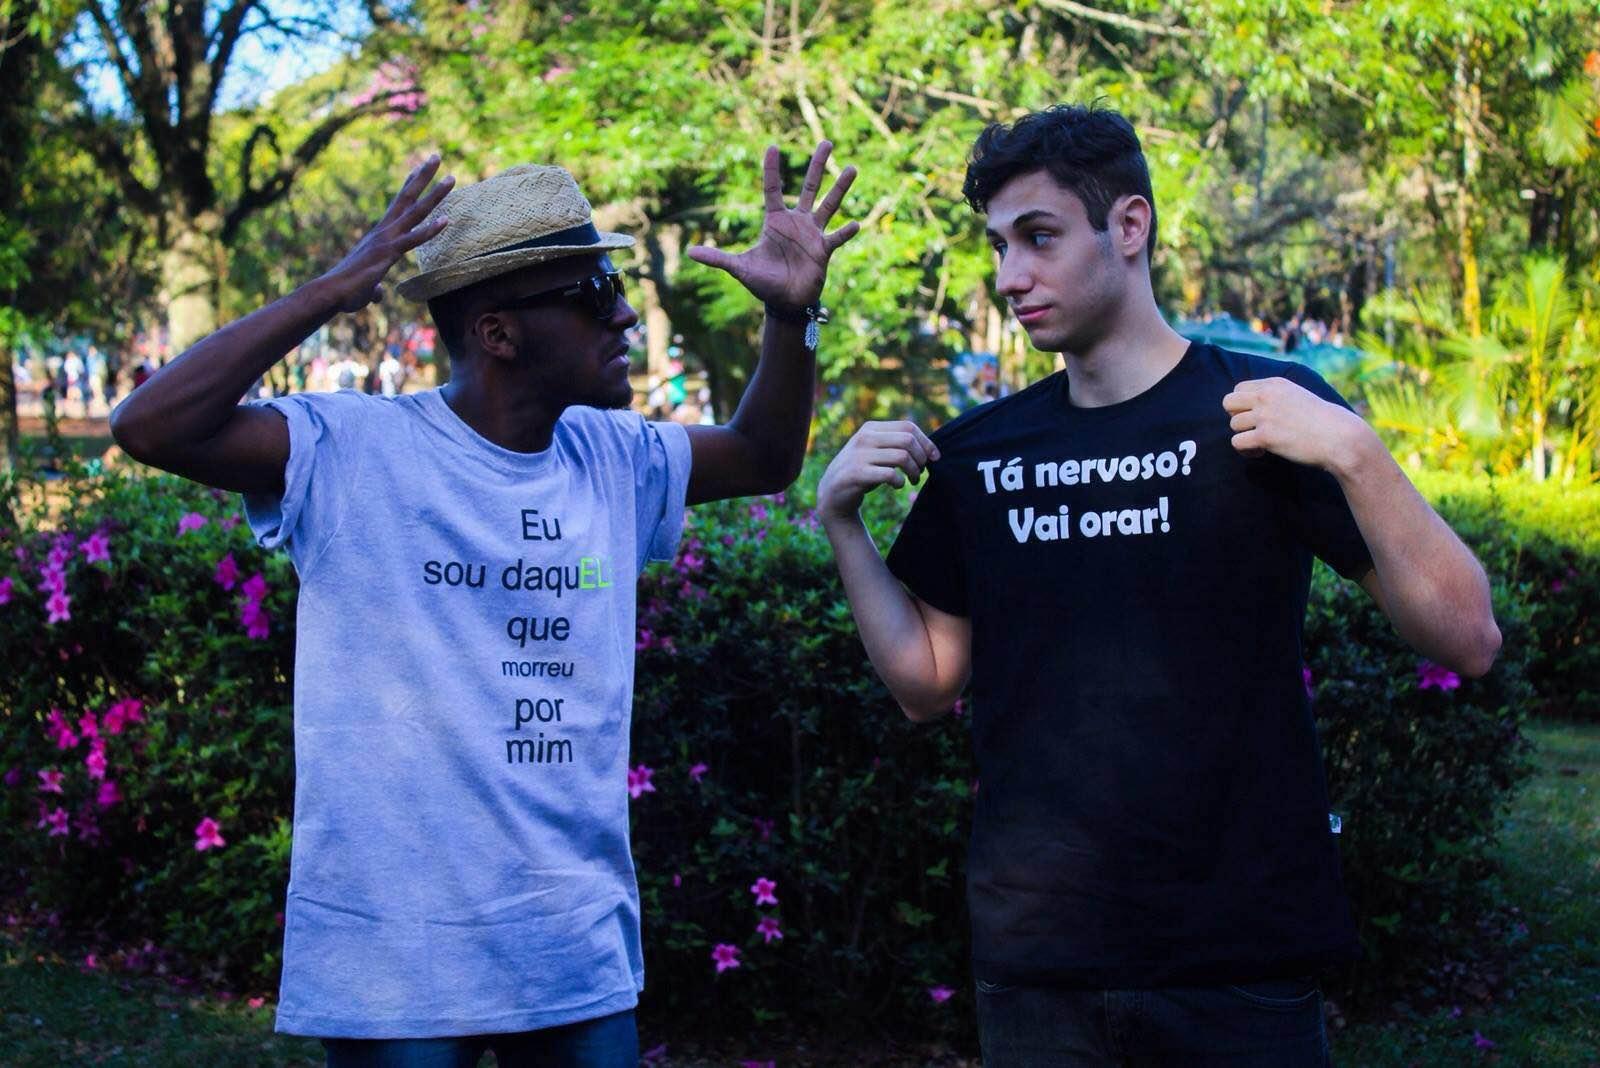 moda evangélica, moda masculina, camiseta evangelica, estampa cristã, moda cristã, menswear, moda sem censura, alex cursino, blog de moda, 2